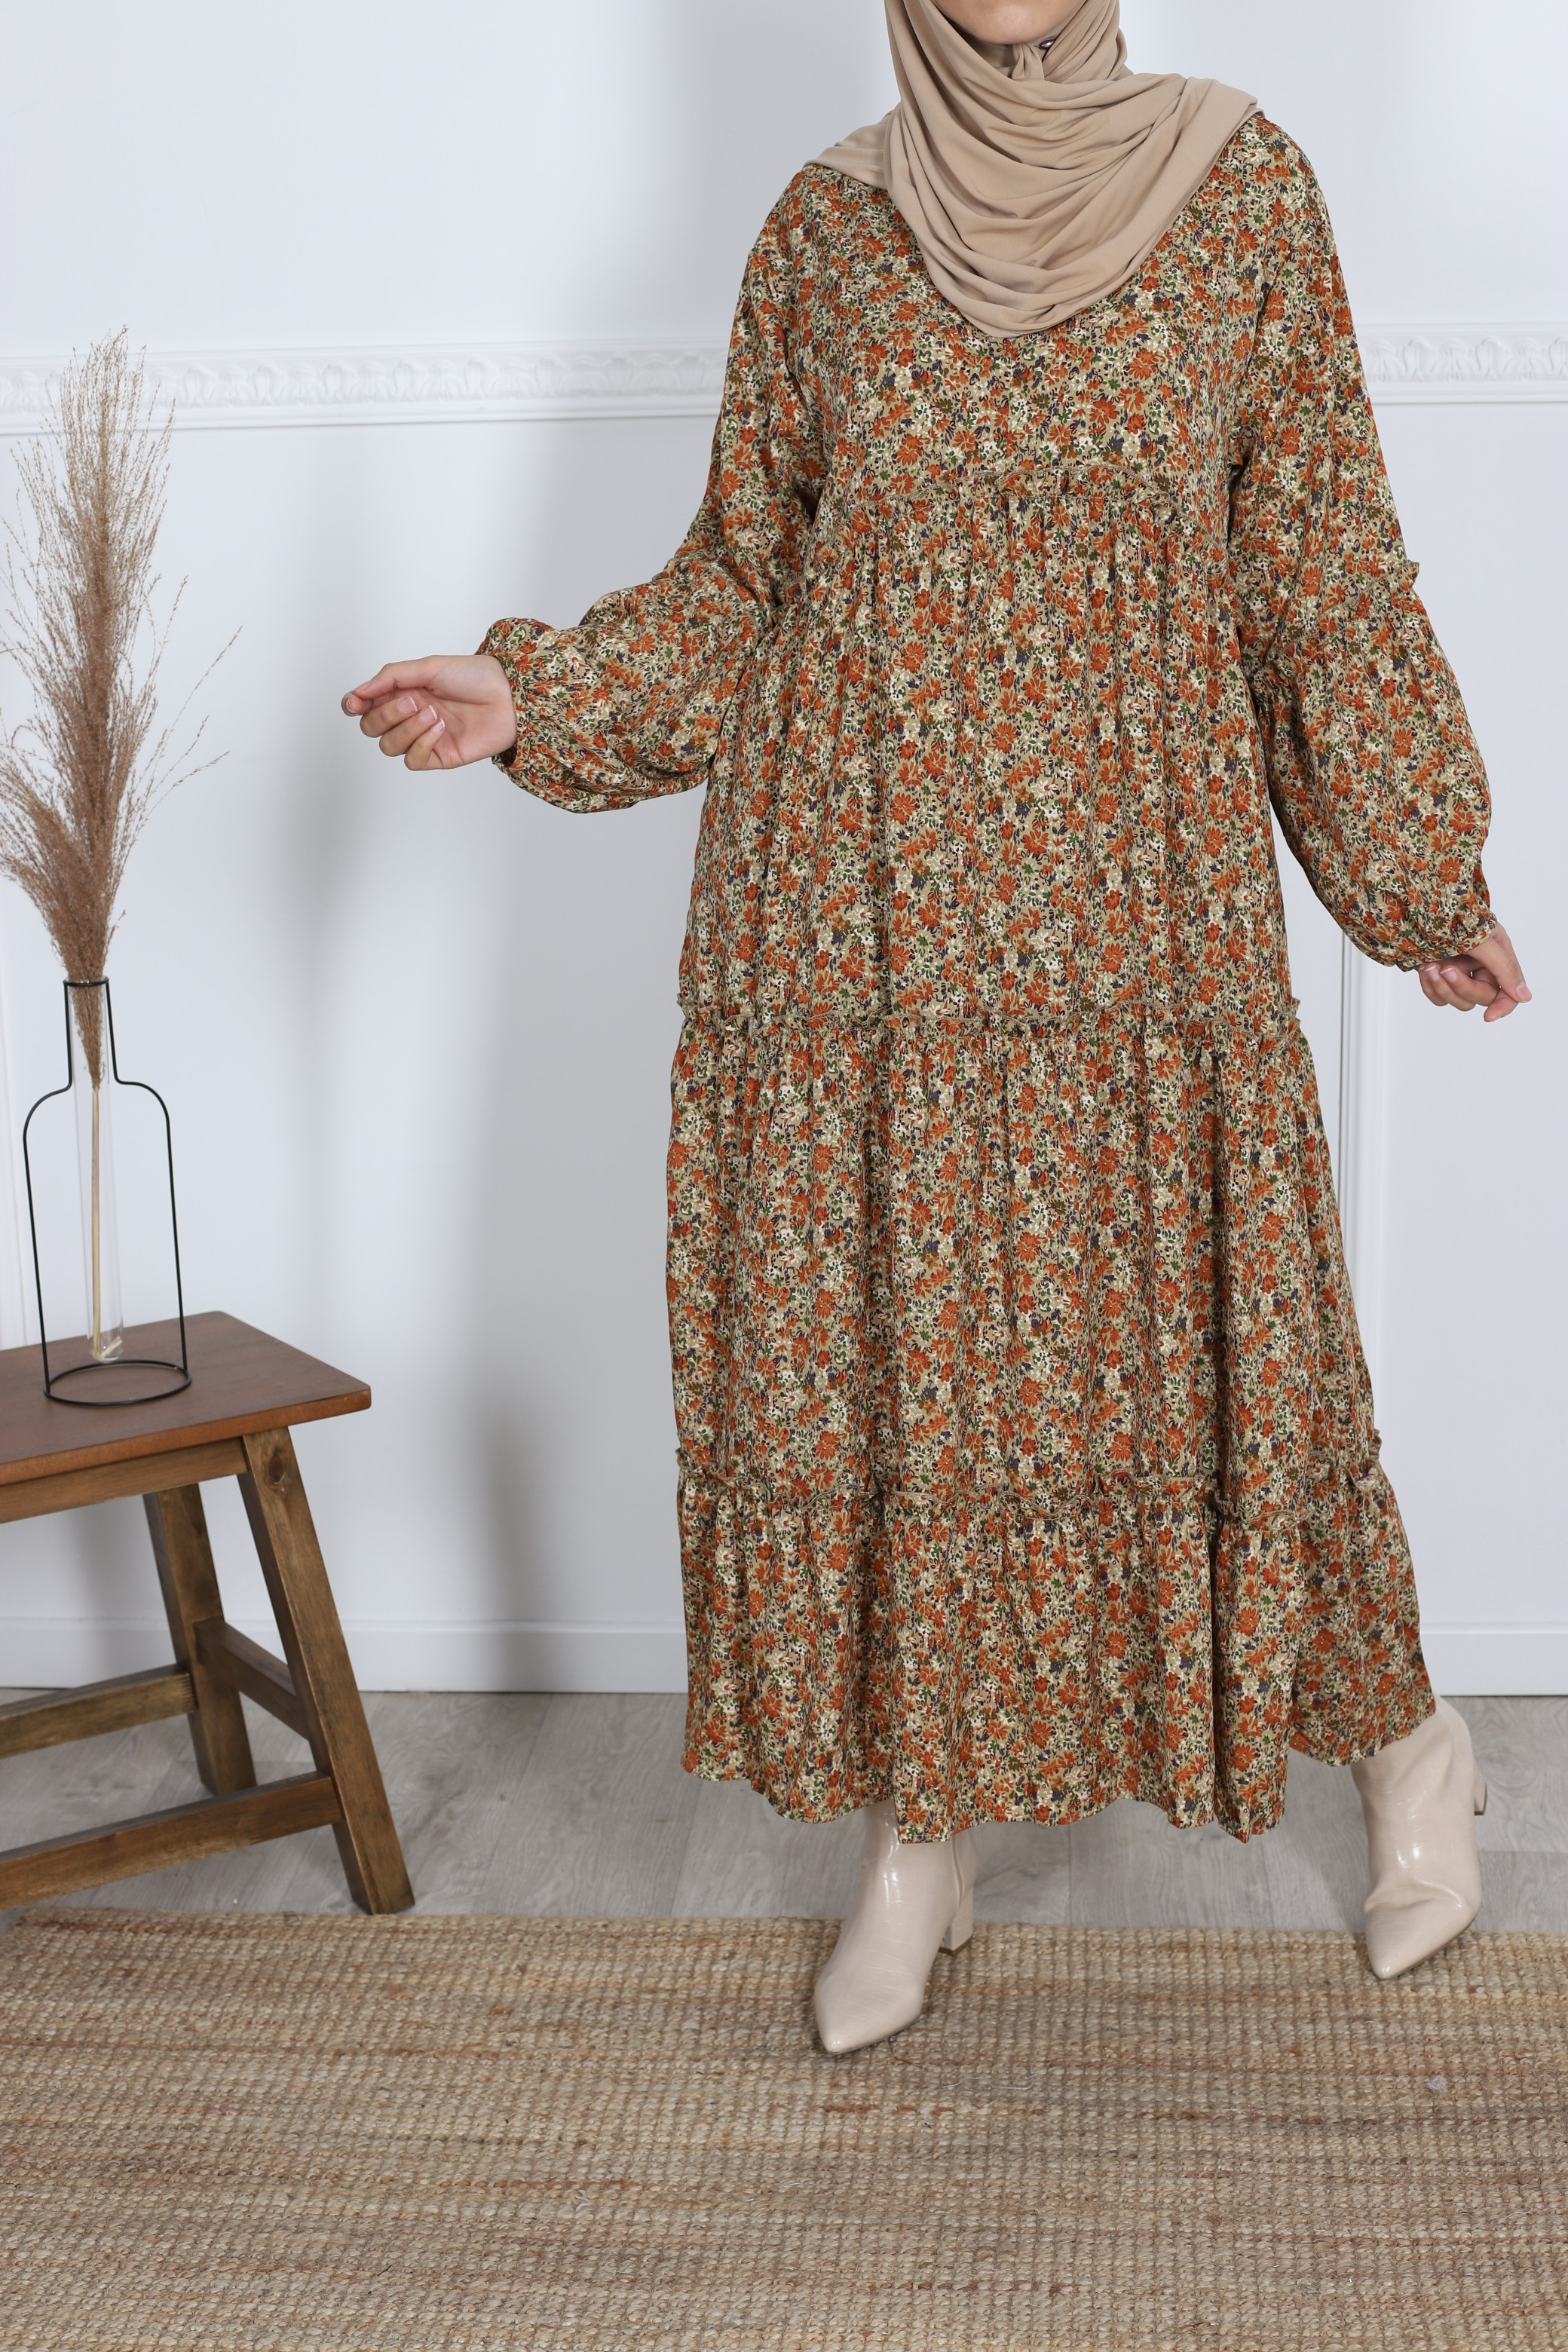 Robe fleuris petite